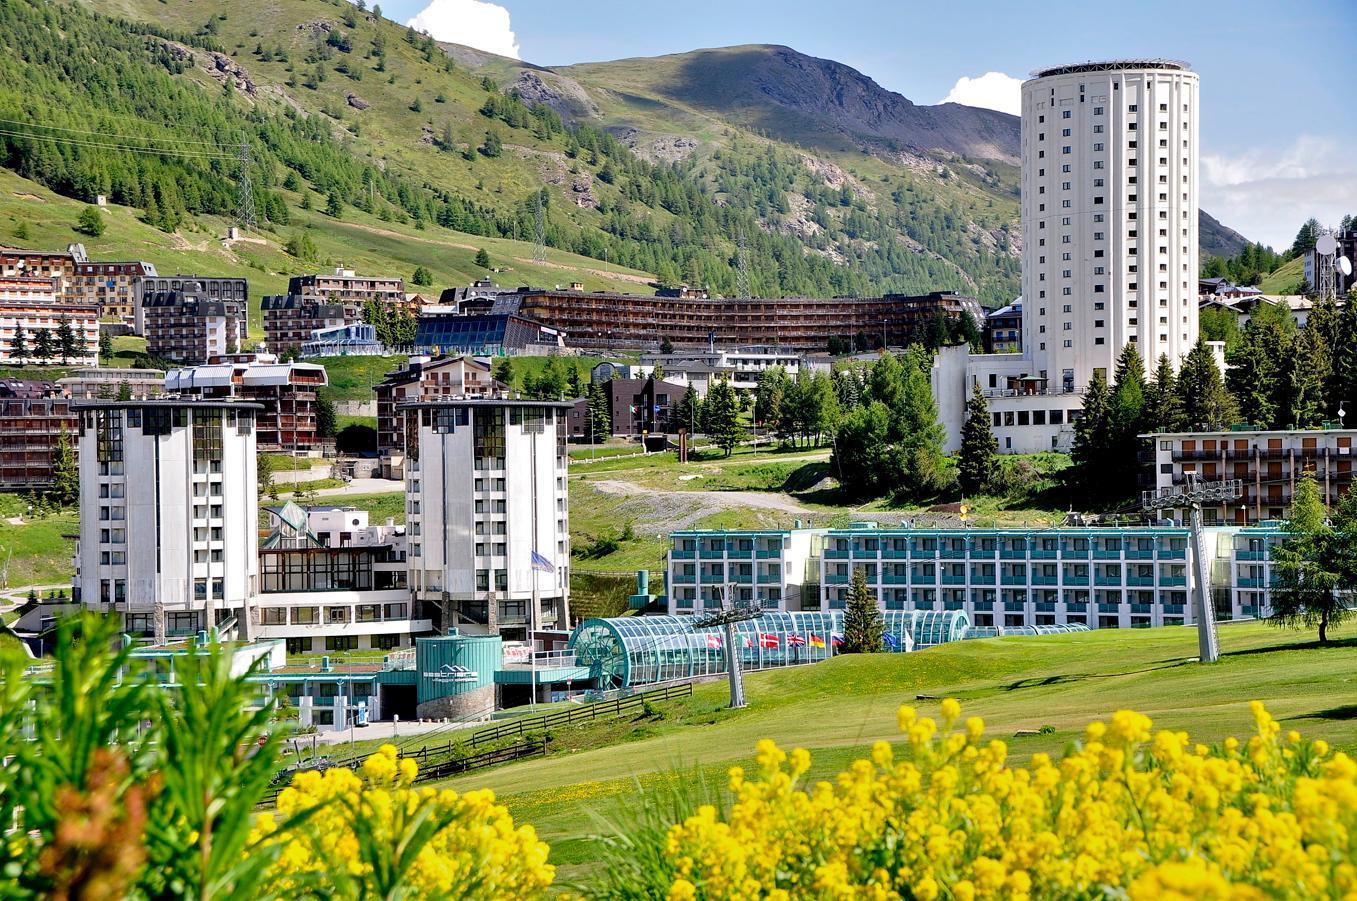 th sestriere hotel per gruppi vacanze in montagna